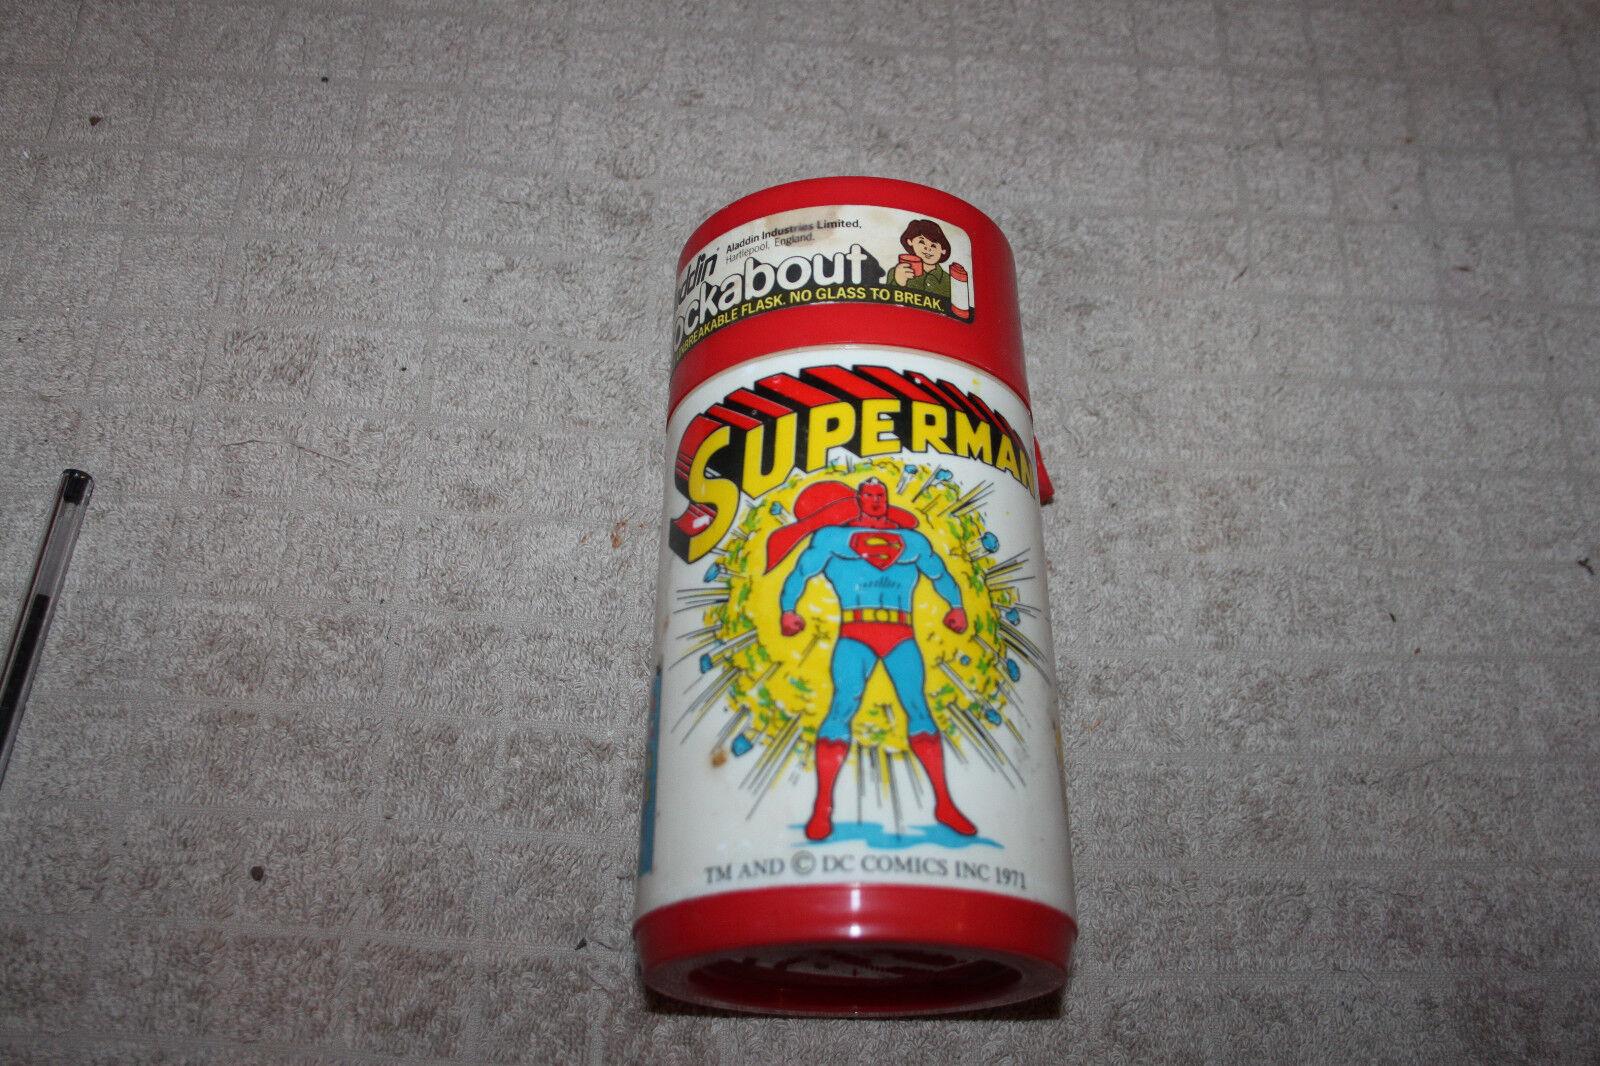 rare THERMOS collection    SUPERMAN de 1971   ENGLAND TM AND cDC COMICS INC